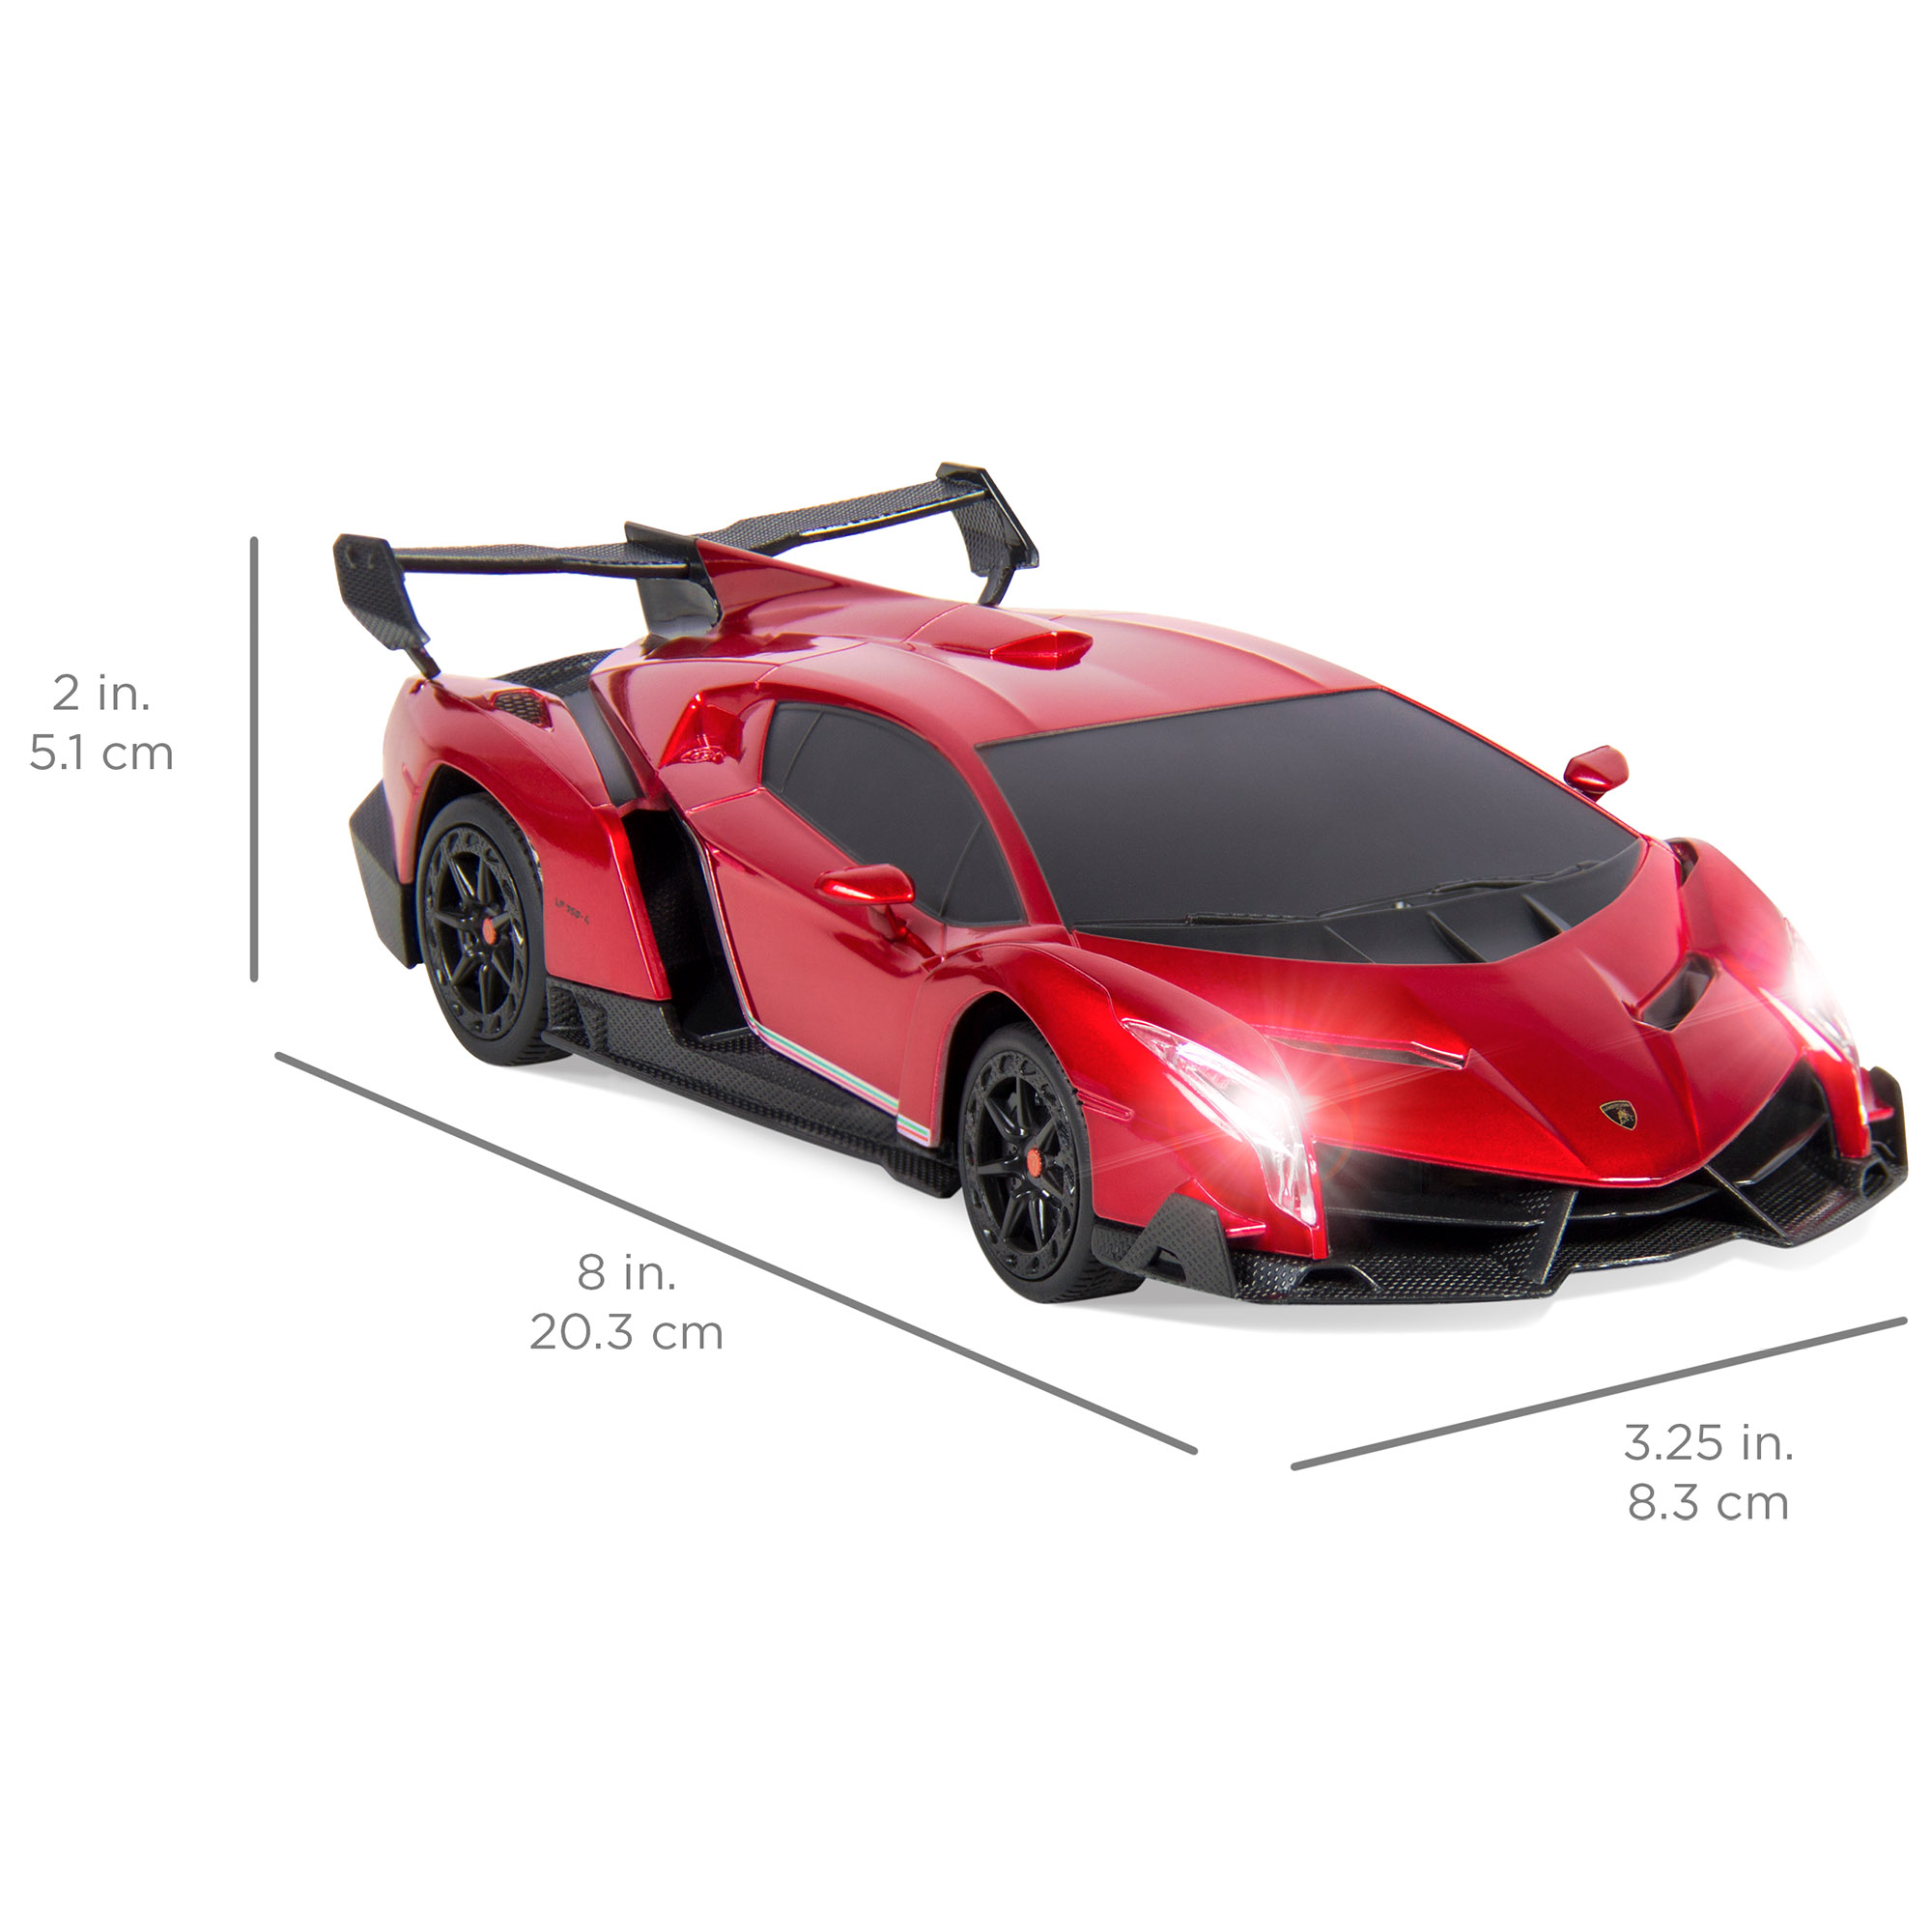 BCP-1-24-Kids-RC-Lamborghini-Veneno-Racing-Car-Toy-w-Lights-Shock-Suspension thumbnail 21